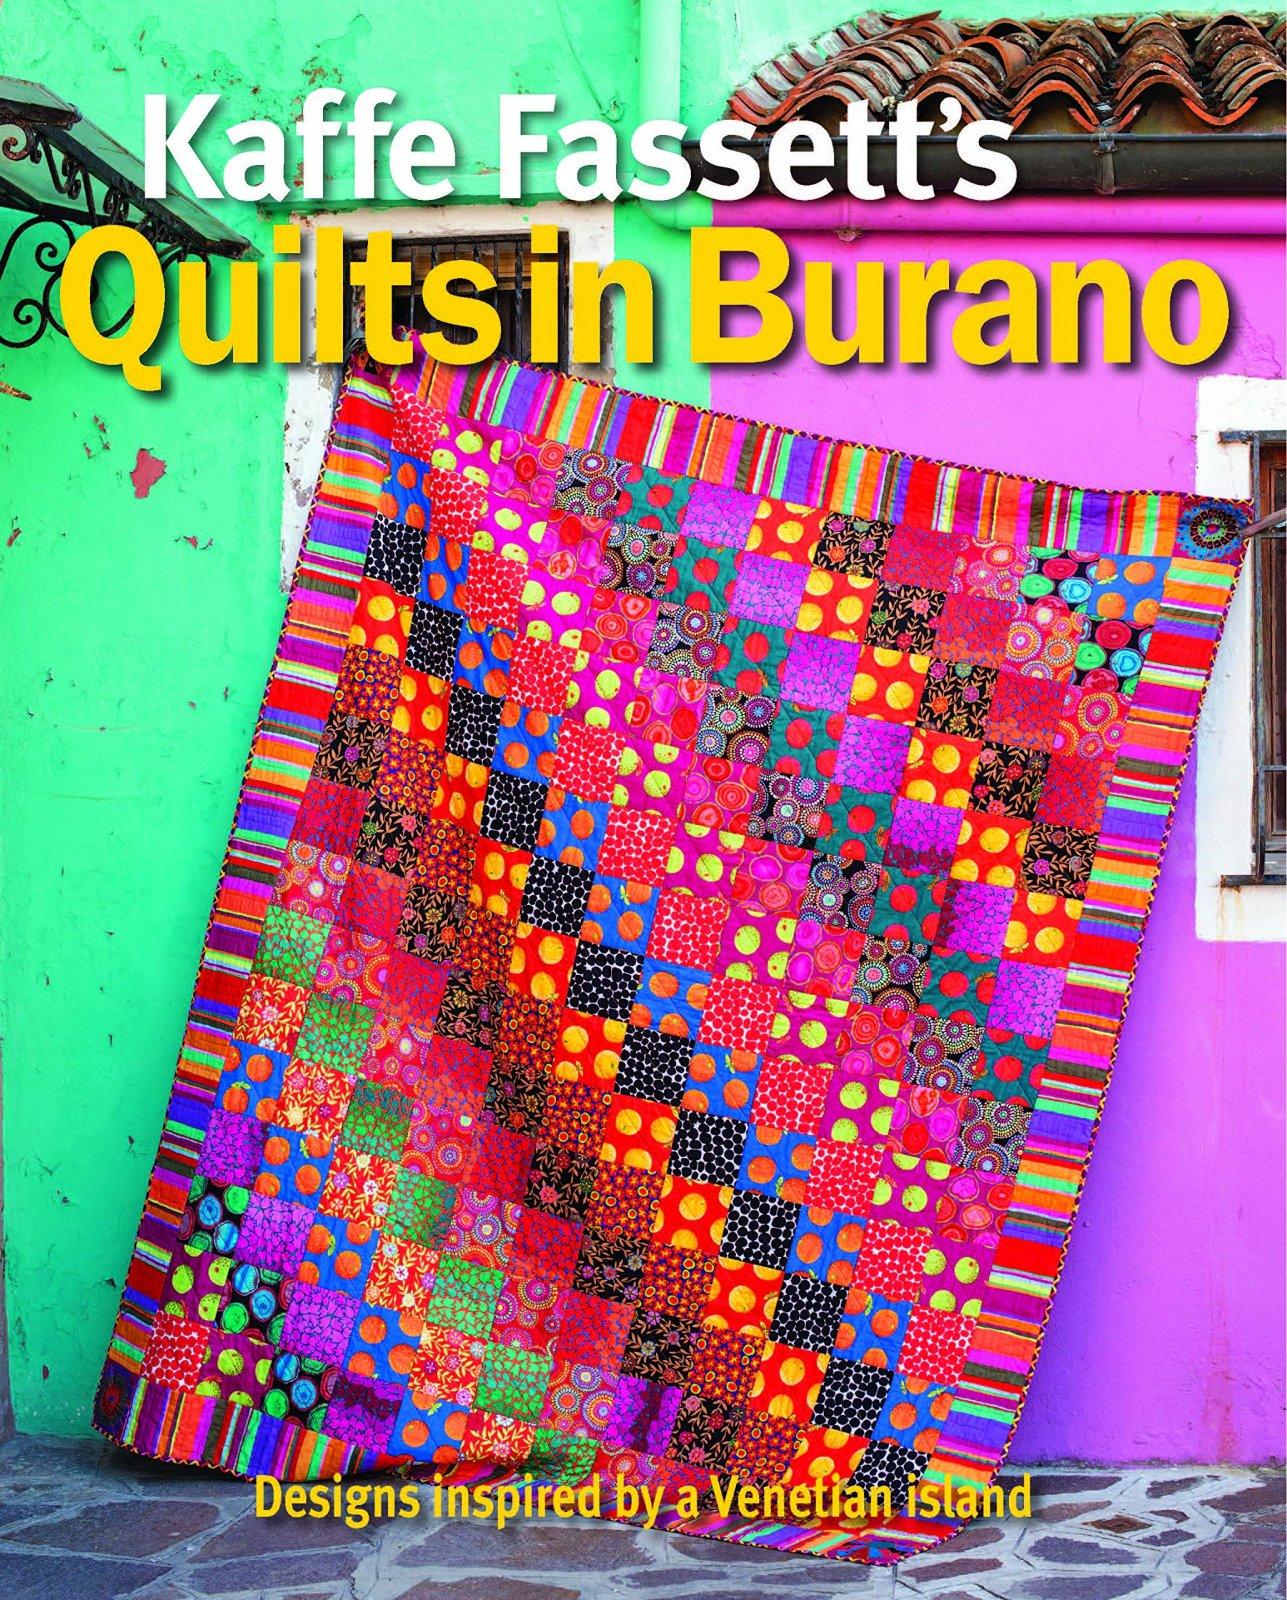 Kaffe Fassett Quilts In Burano